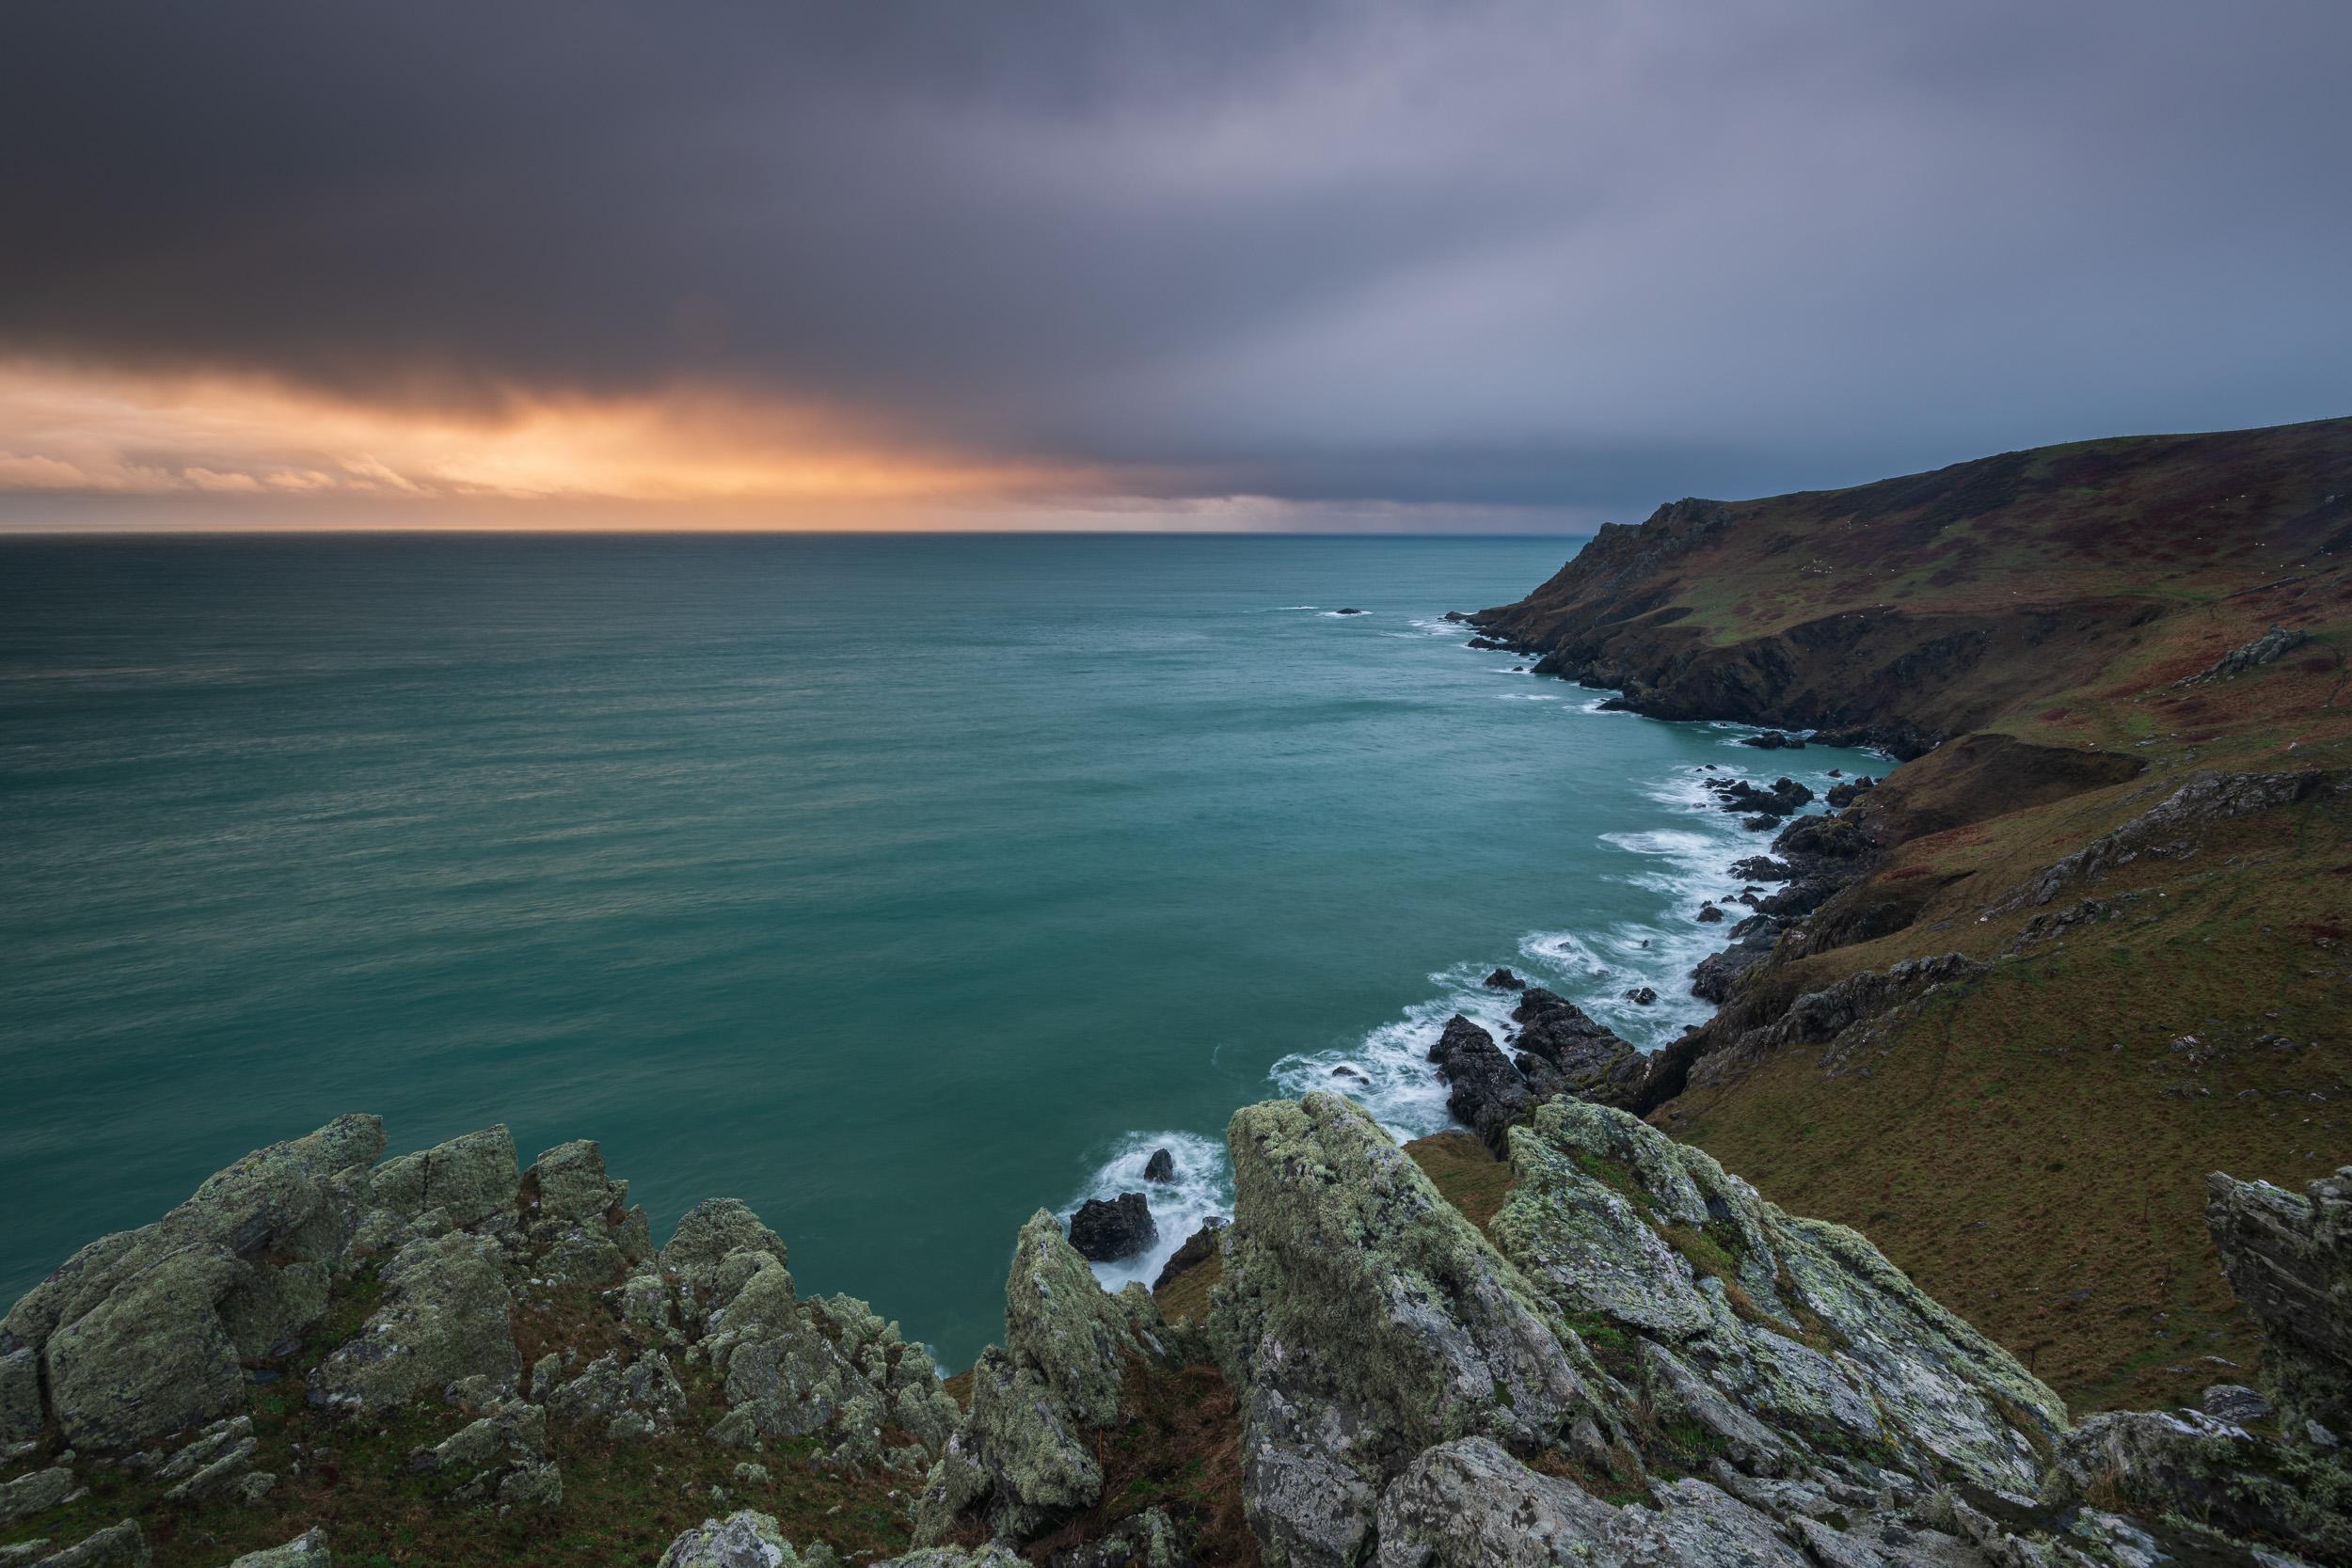 Breaking Light at Start Point, Devon  - Nikon D850, Nikkor 16-35 mm f/4 at 18 mm, f/13, 2 seconds at ISO 64, polariser, ND grad.